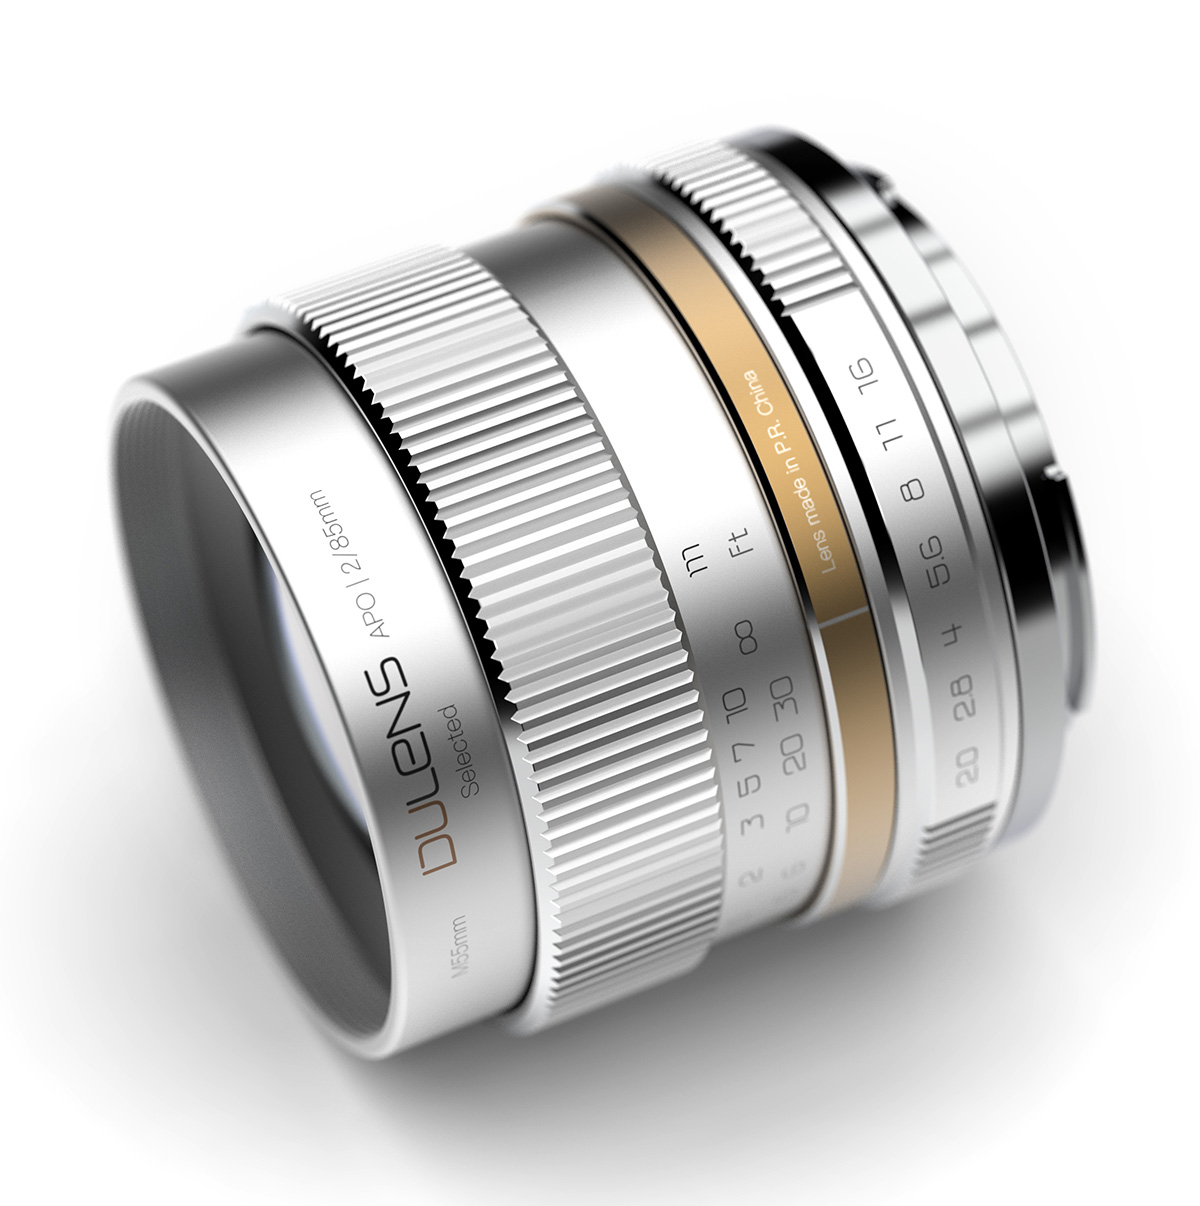 nikon d3000 manual focus lens